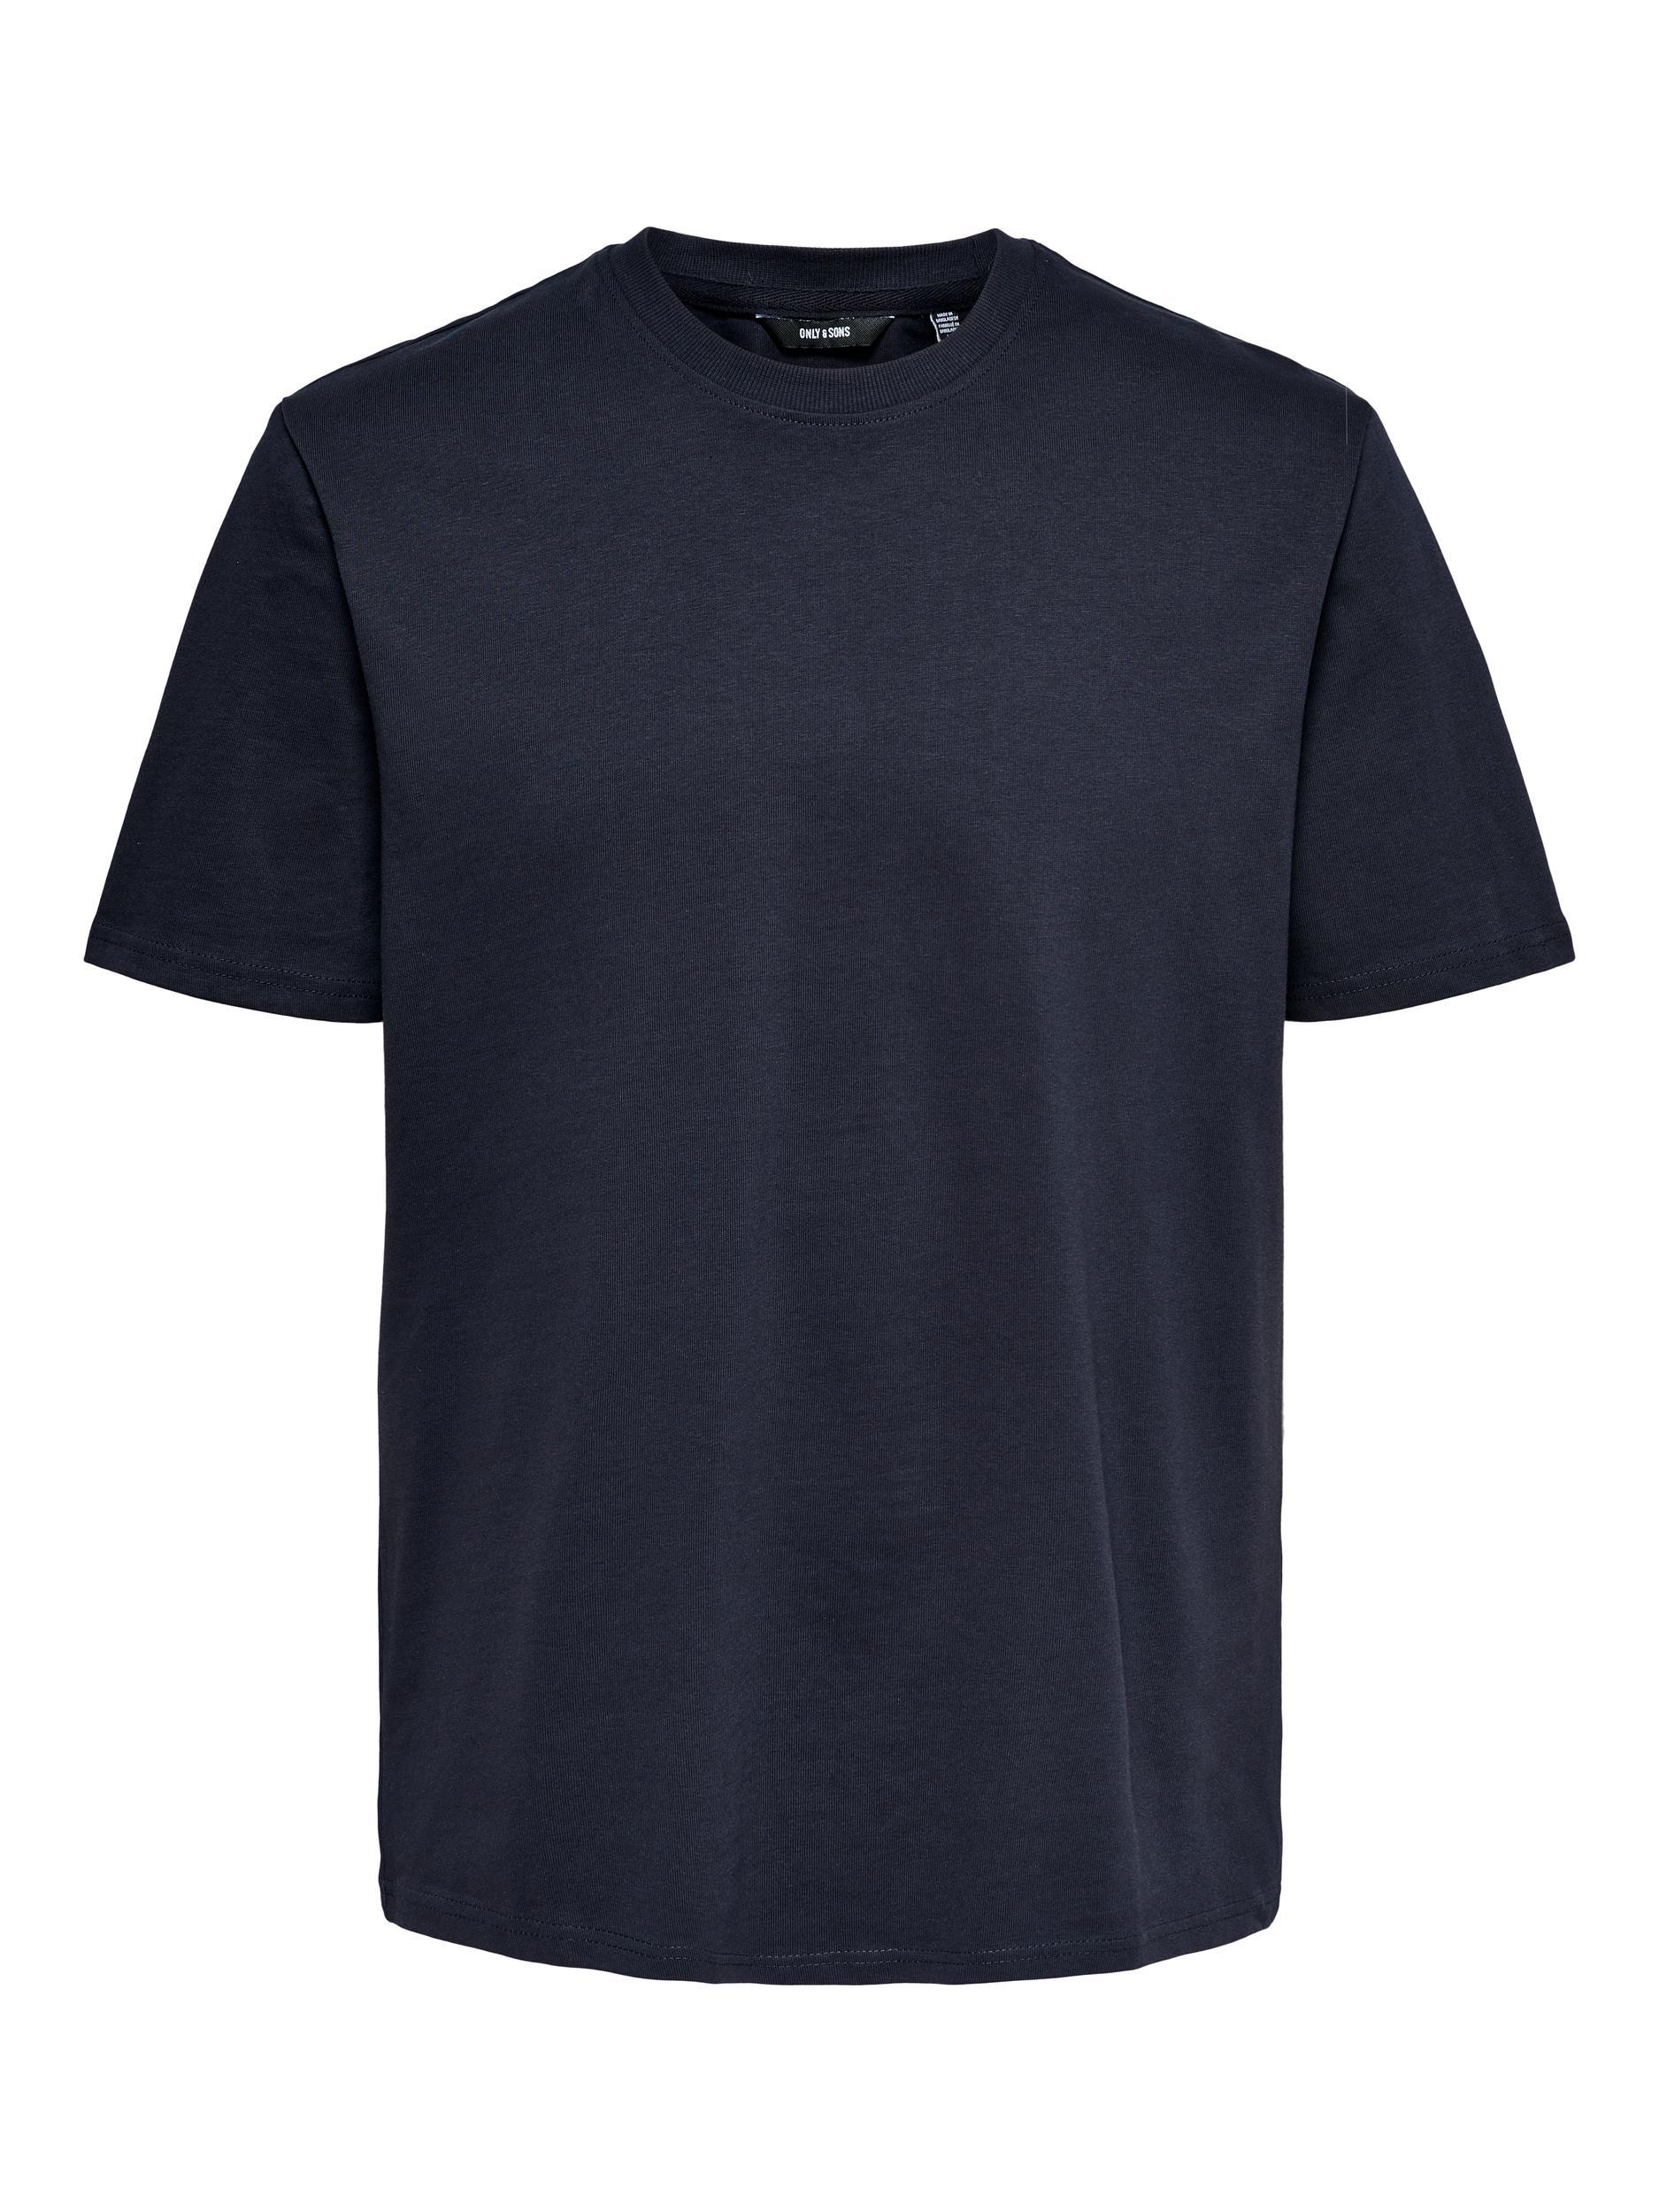 Only & Sons Anel Life SS t-shirt, dark navy, medium